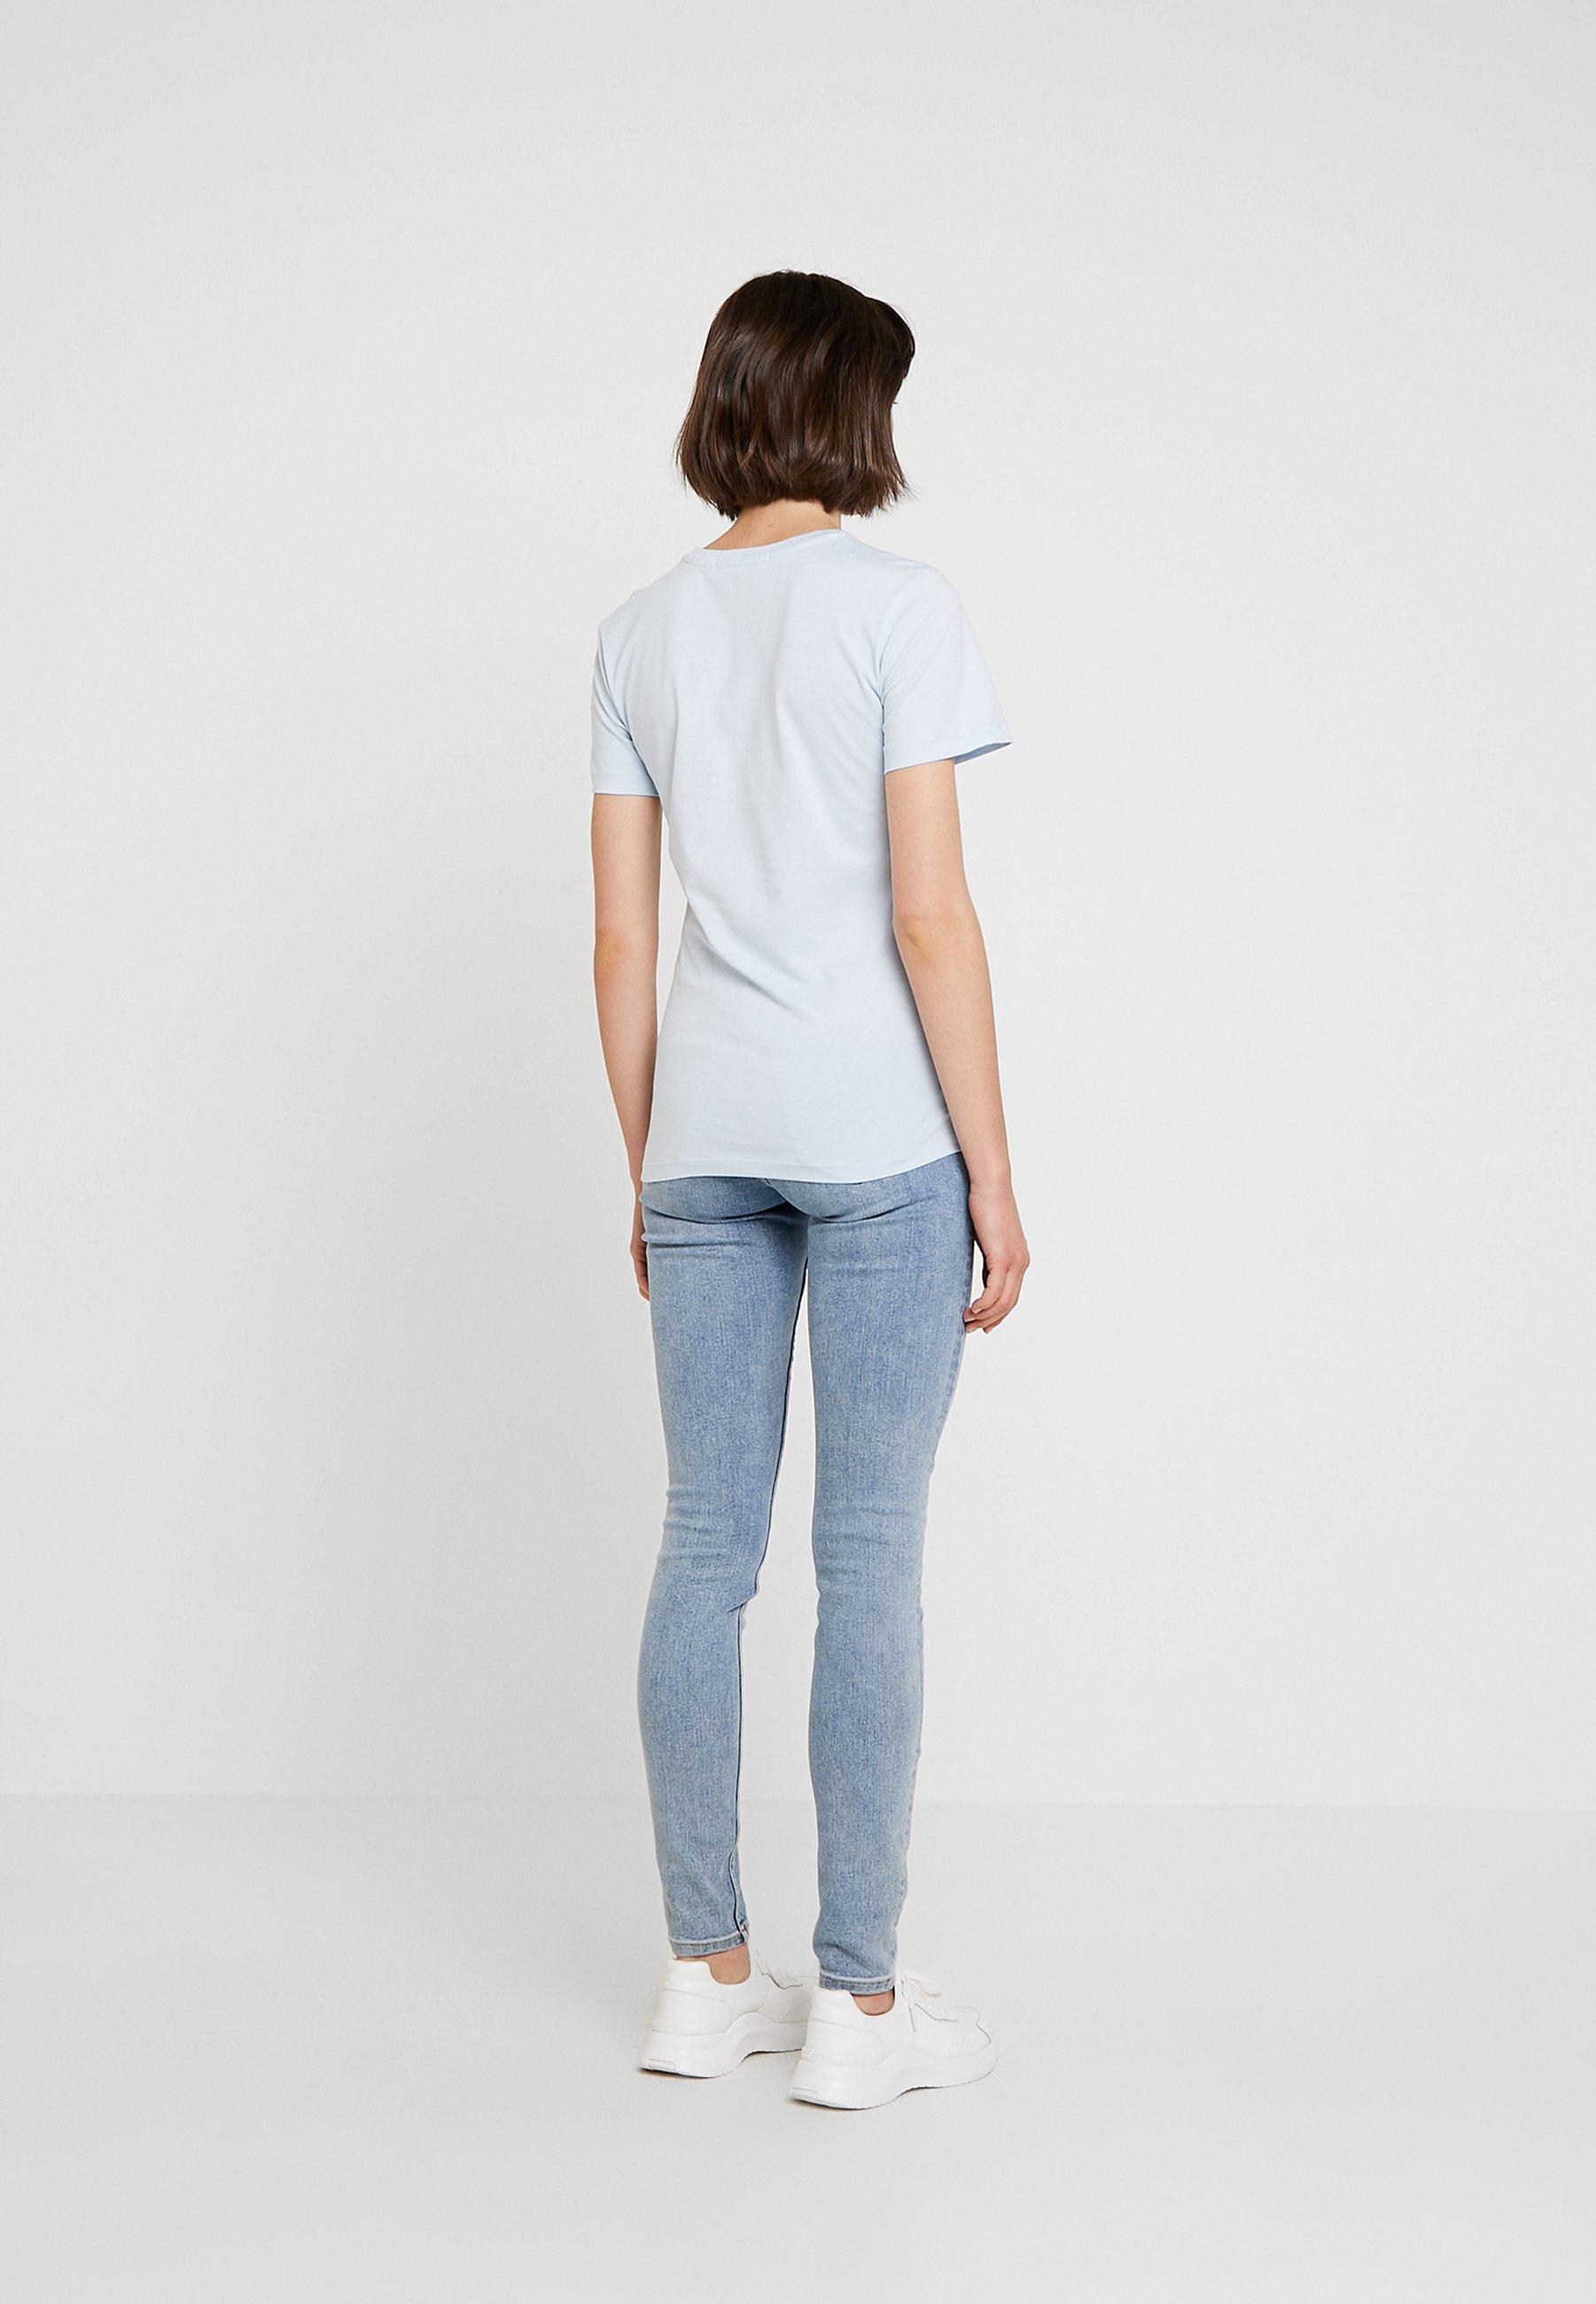 TeeT Slim shirt Jeans Imprimé Calvin SkywayBlossom Institutional Klein Box wXN8n0POk